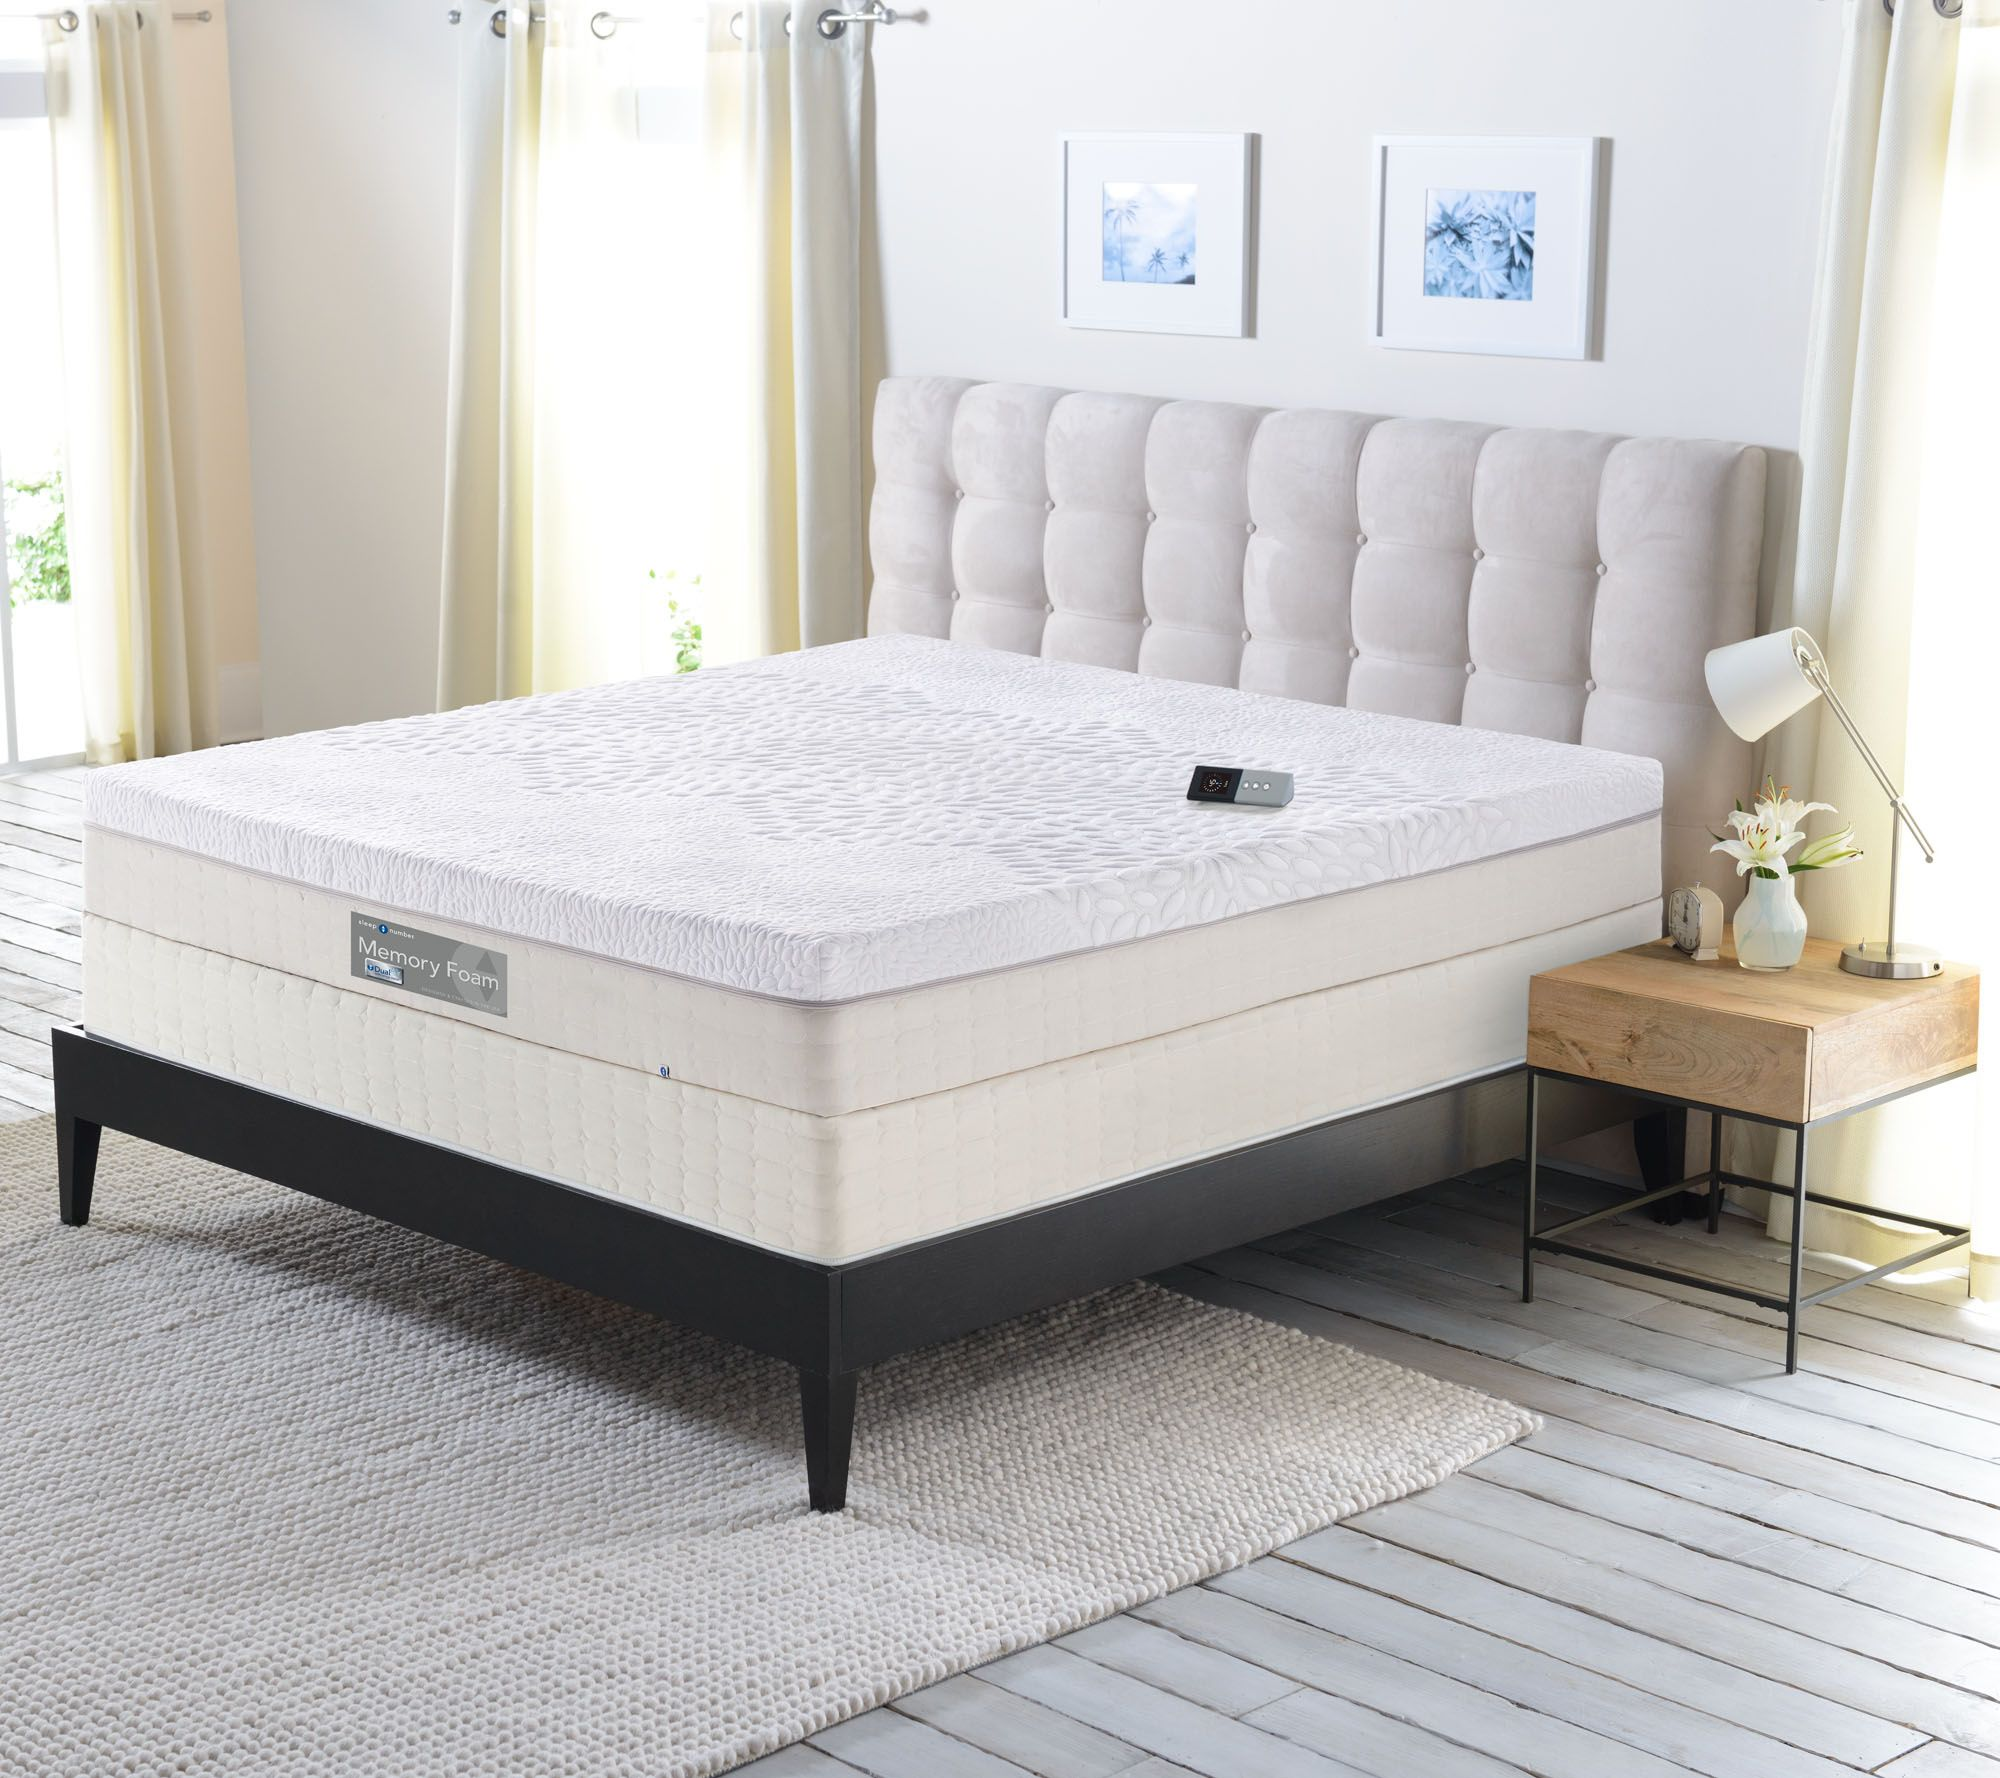 sleep number memory foam cal king mattress with modular